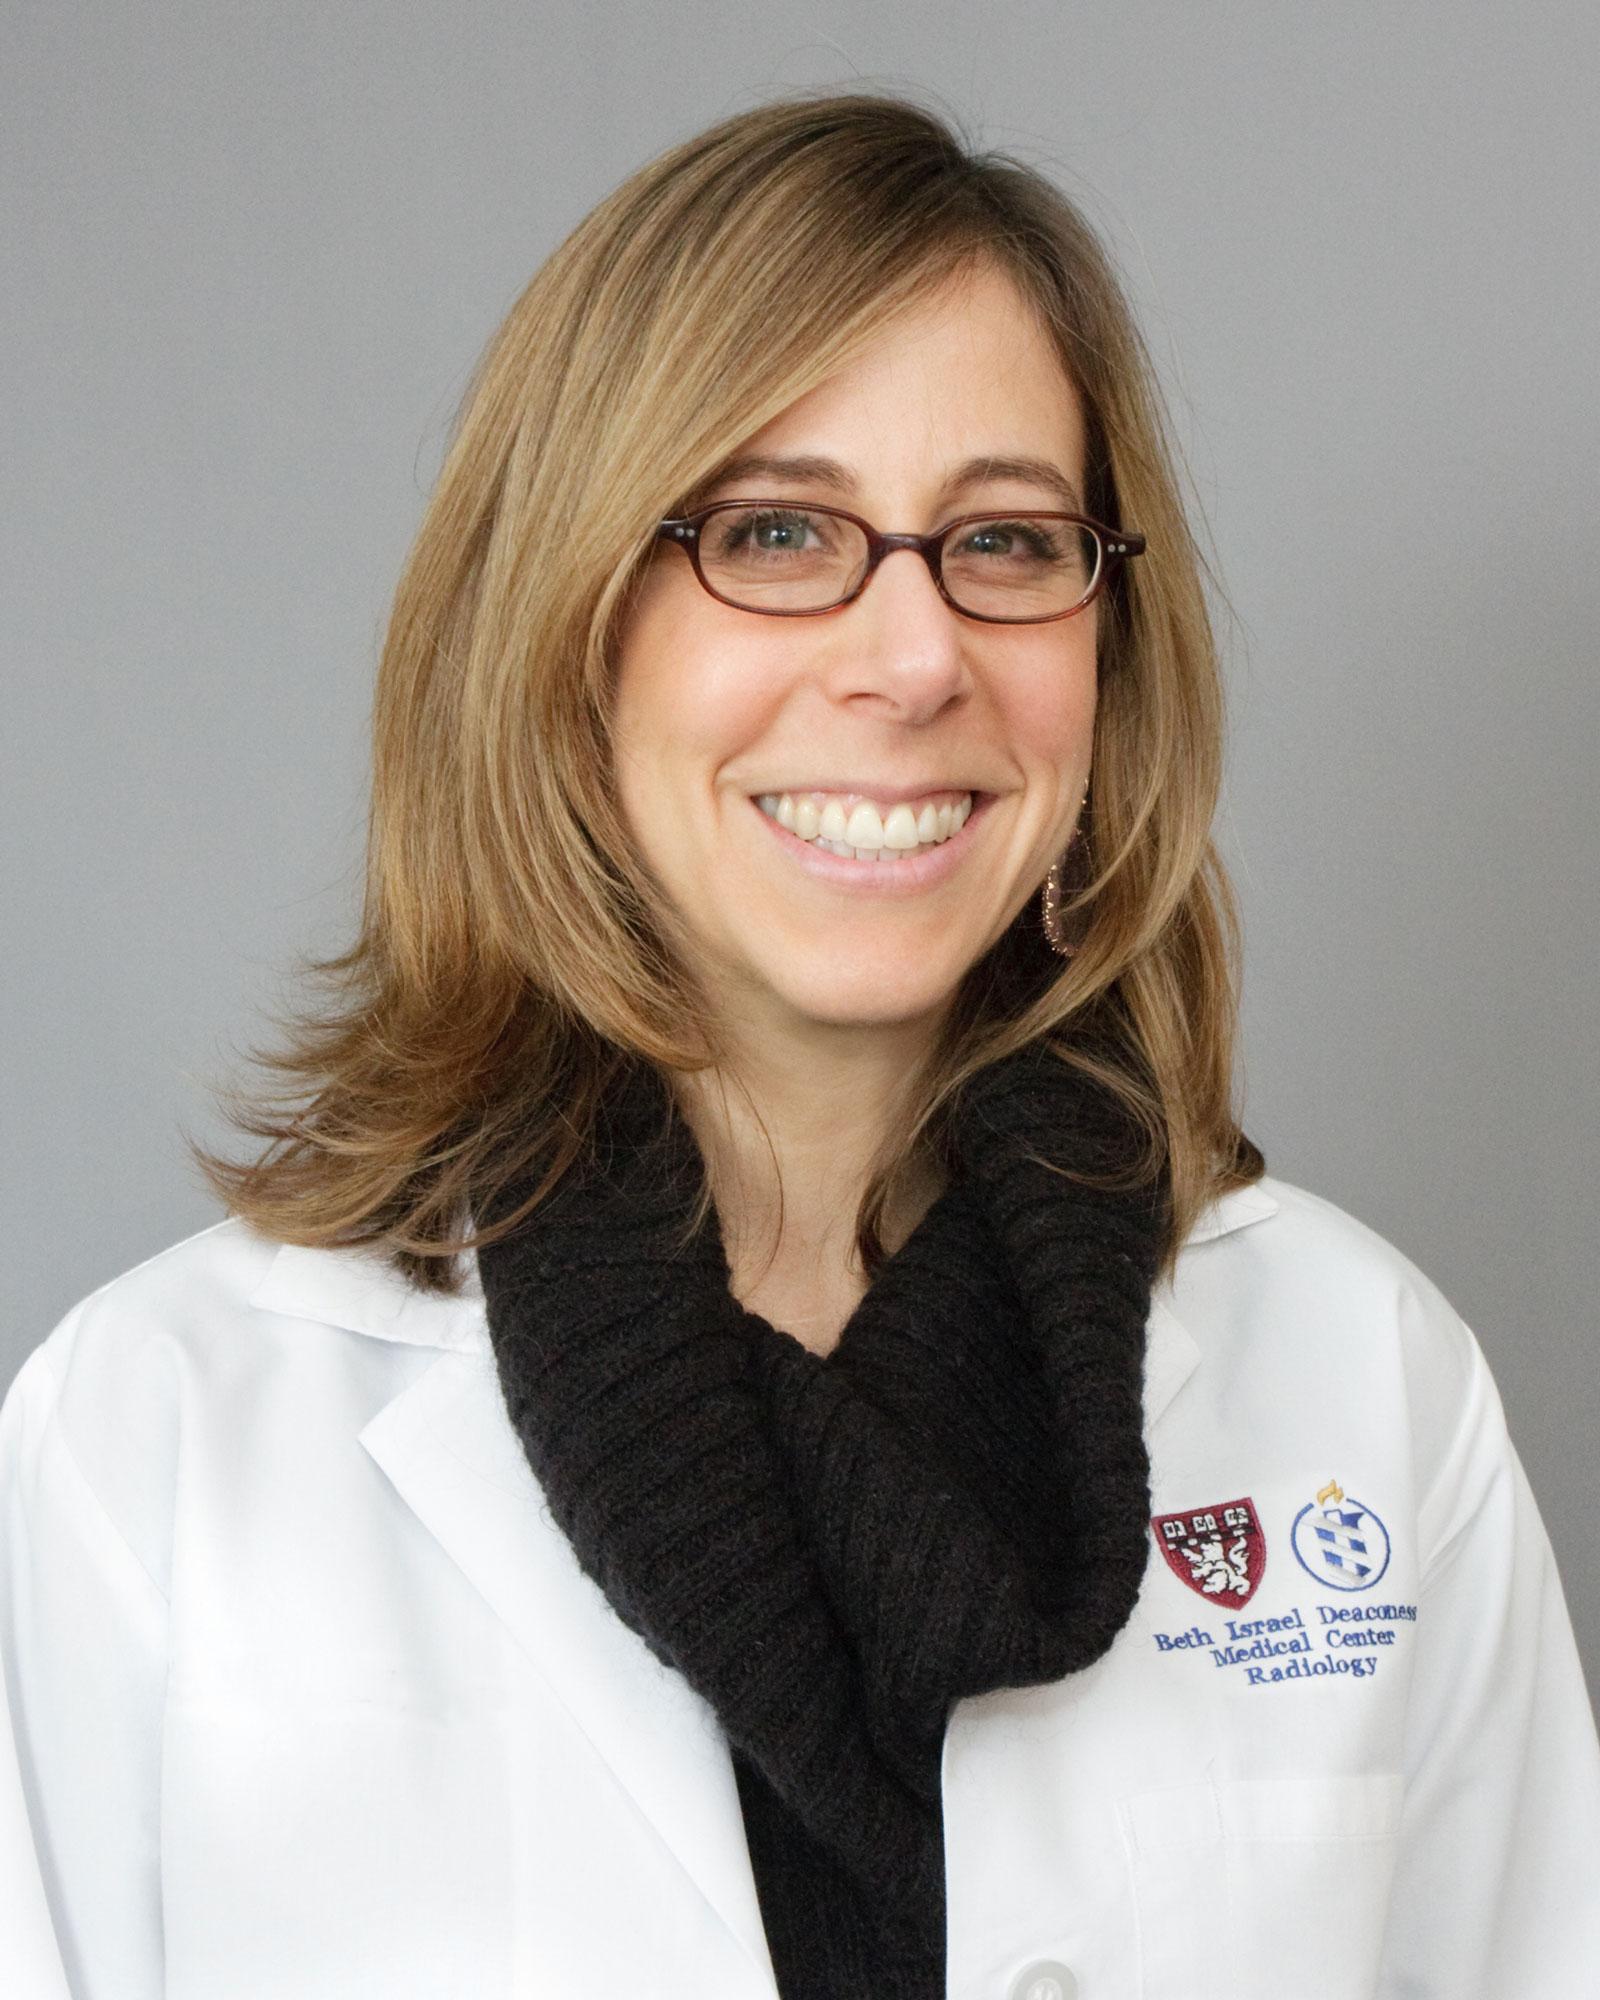 Jordana Phillips, M.D.